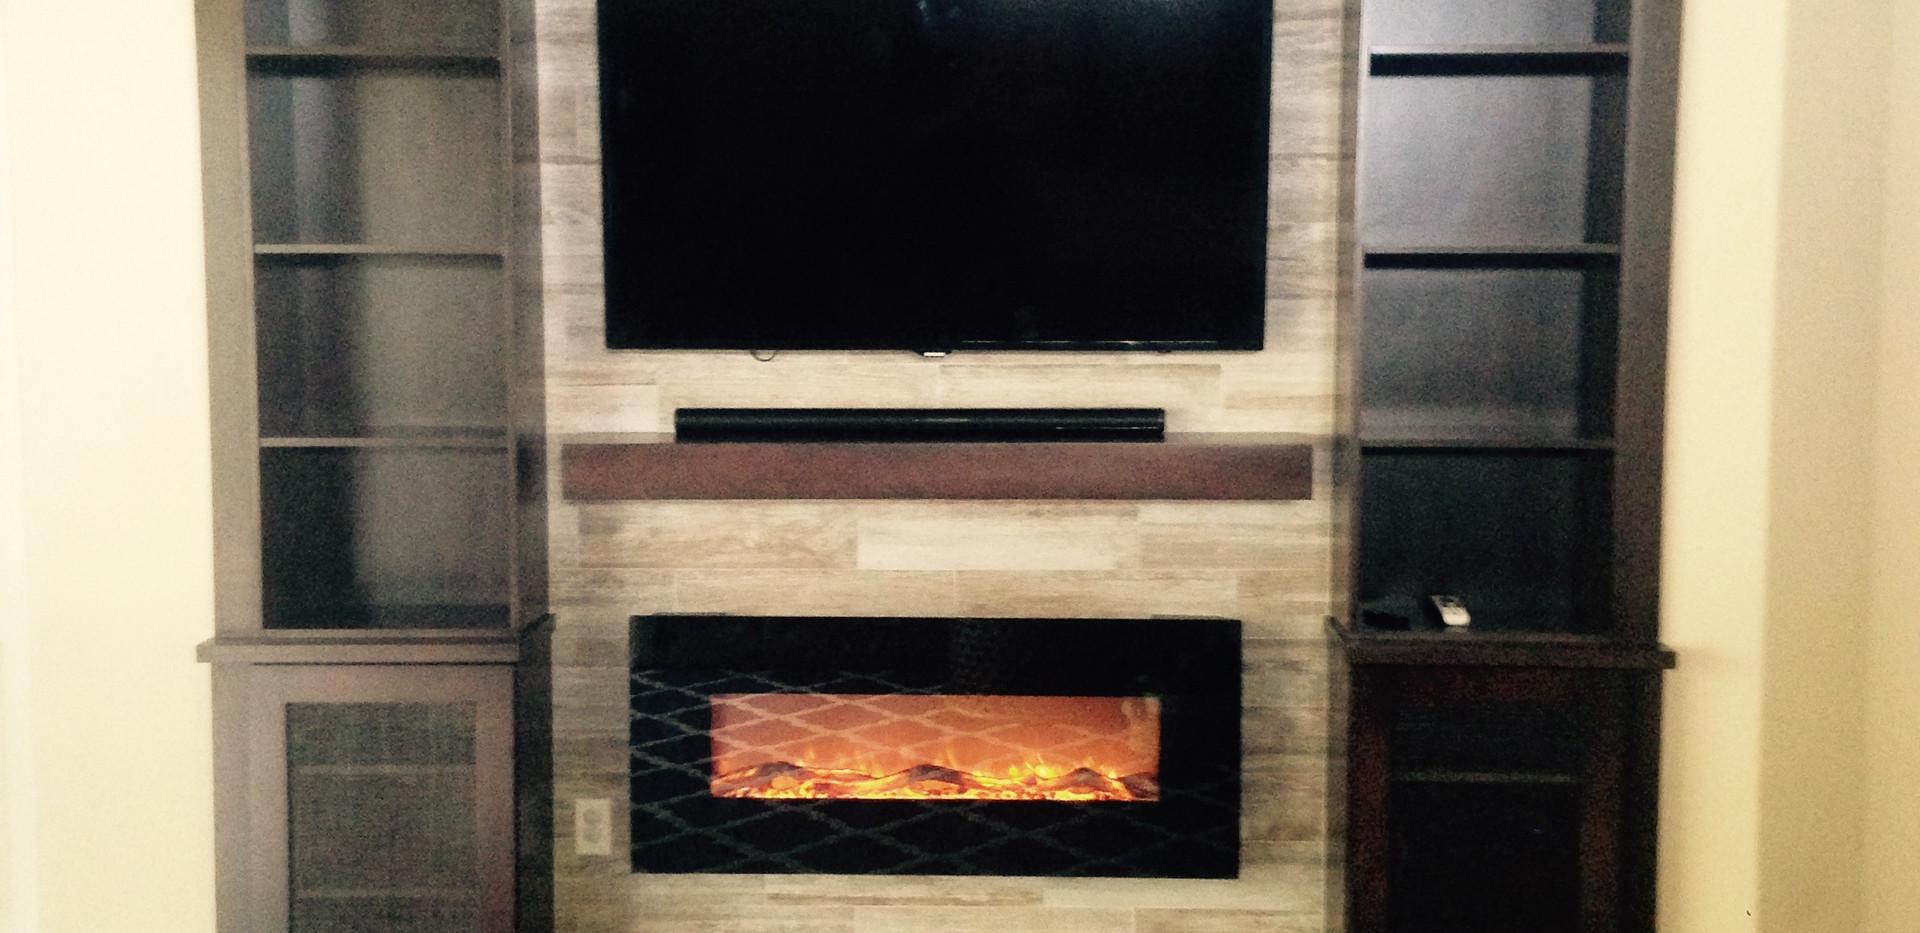 TV Fireplace FINSIH.jpeg